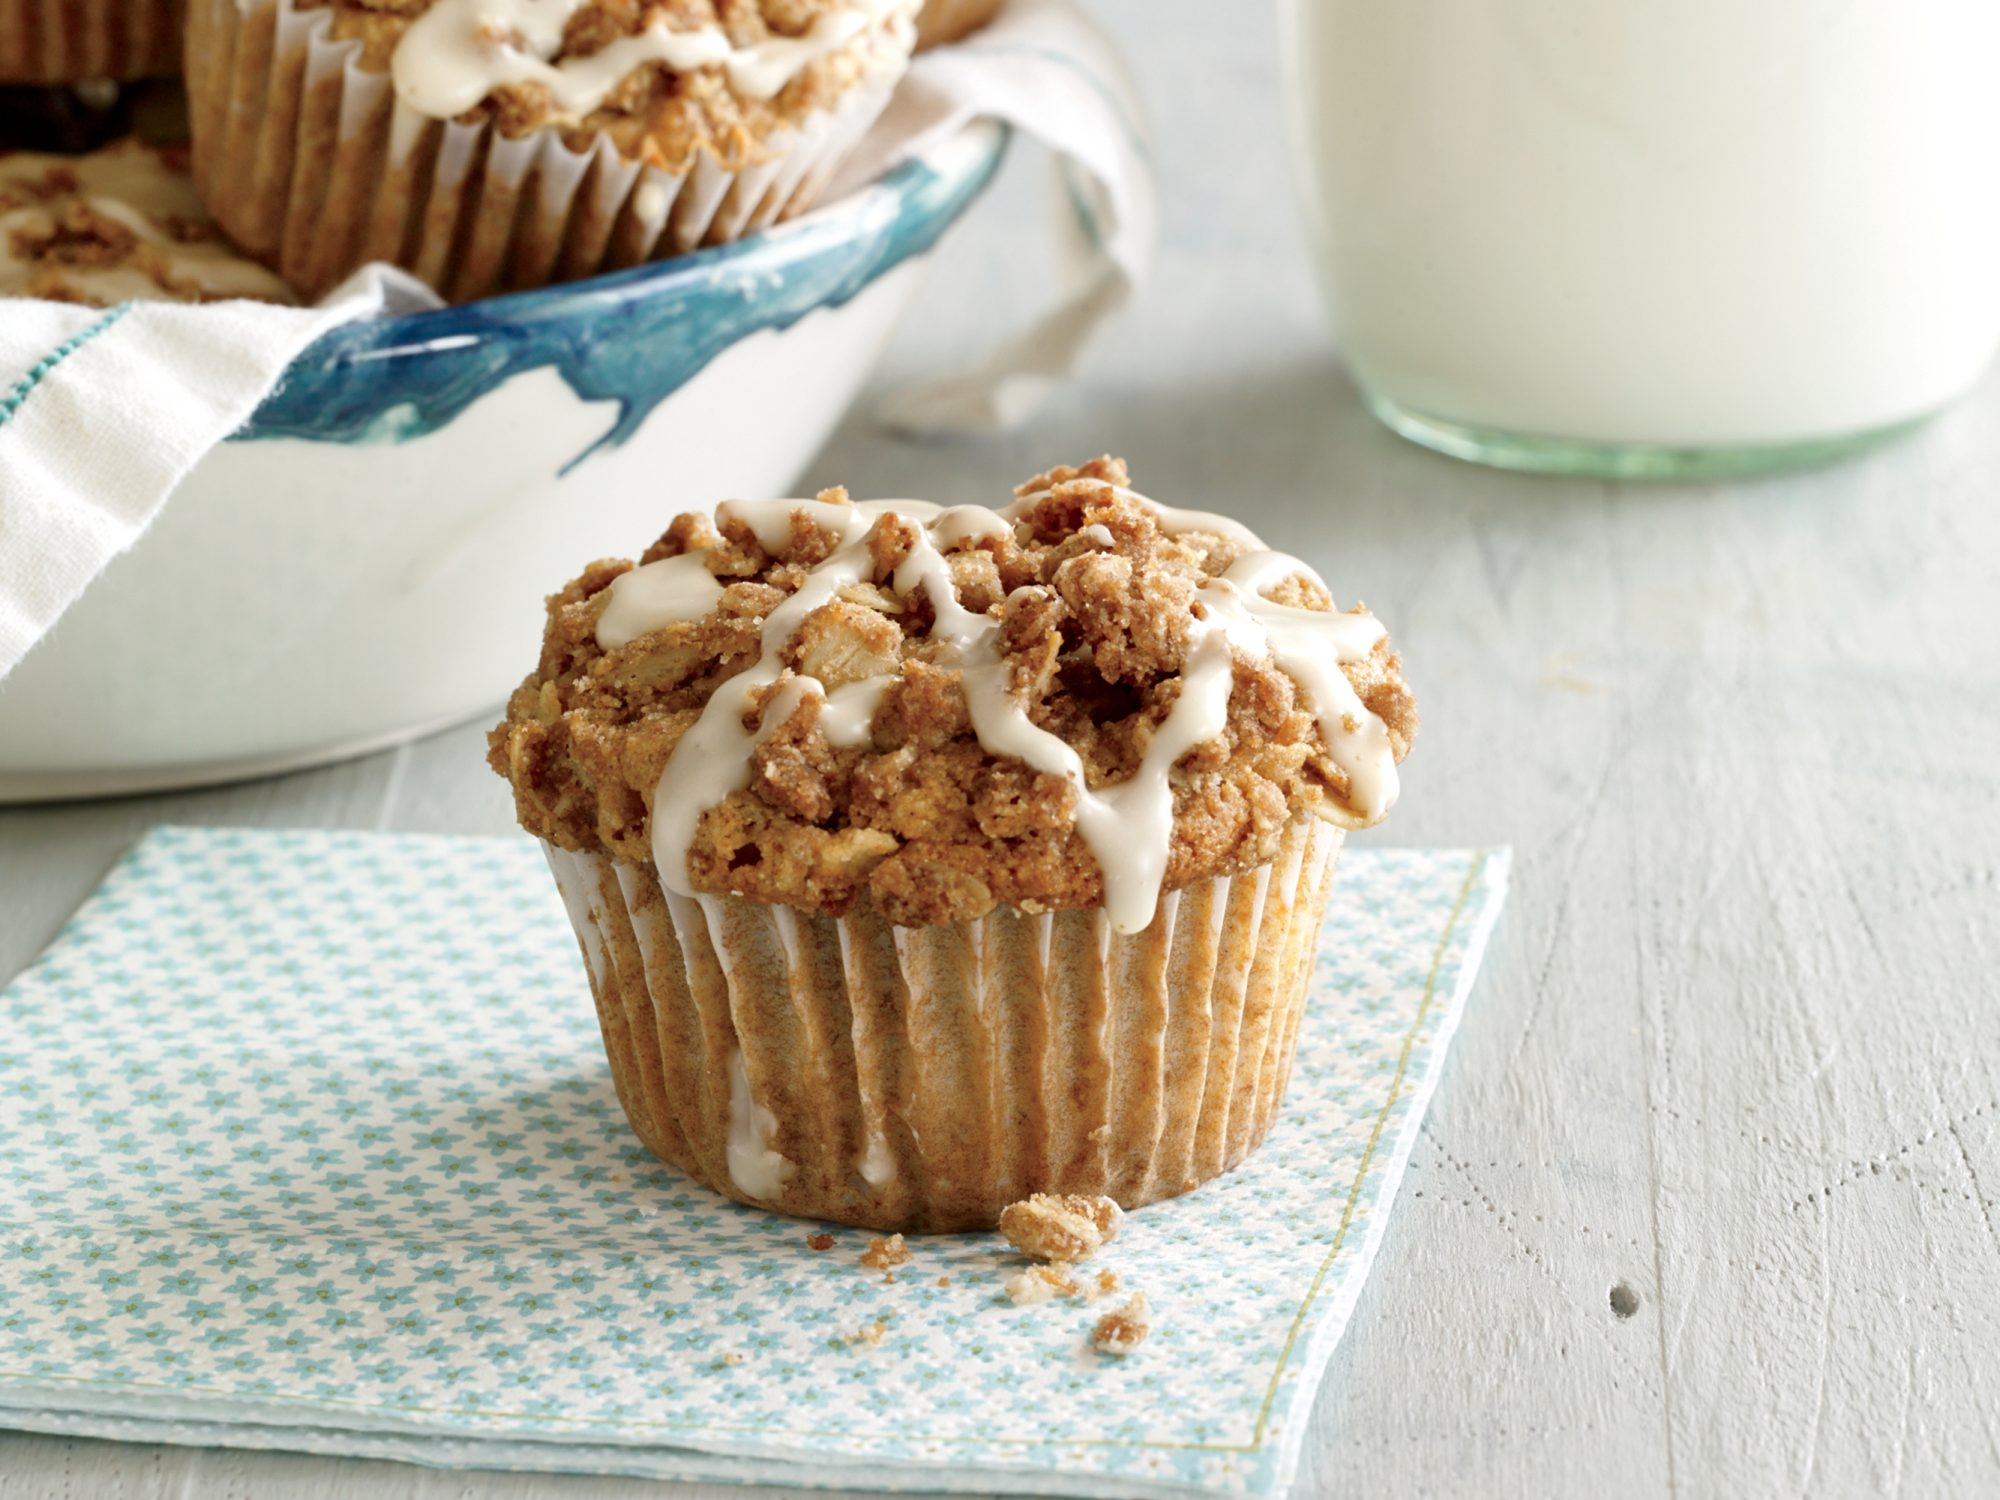 1409p149-apple-streusel-muffins-maple-drizzle-crop.jpg